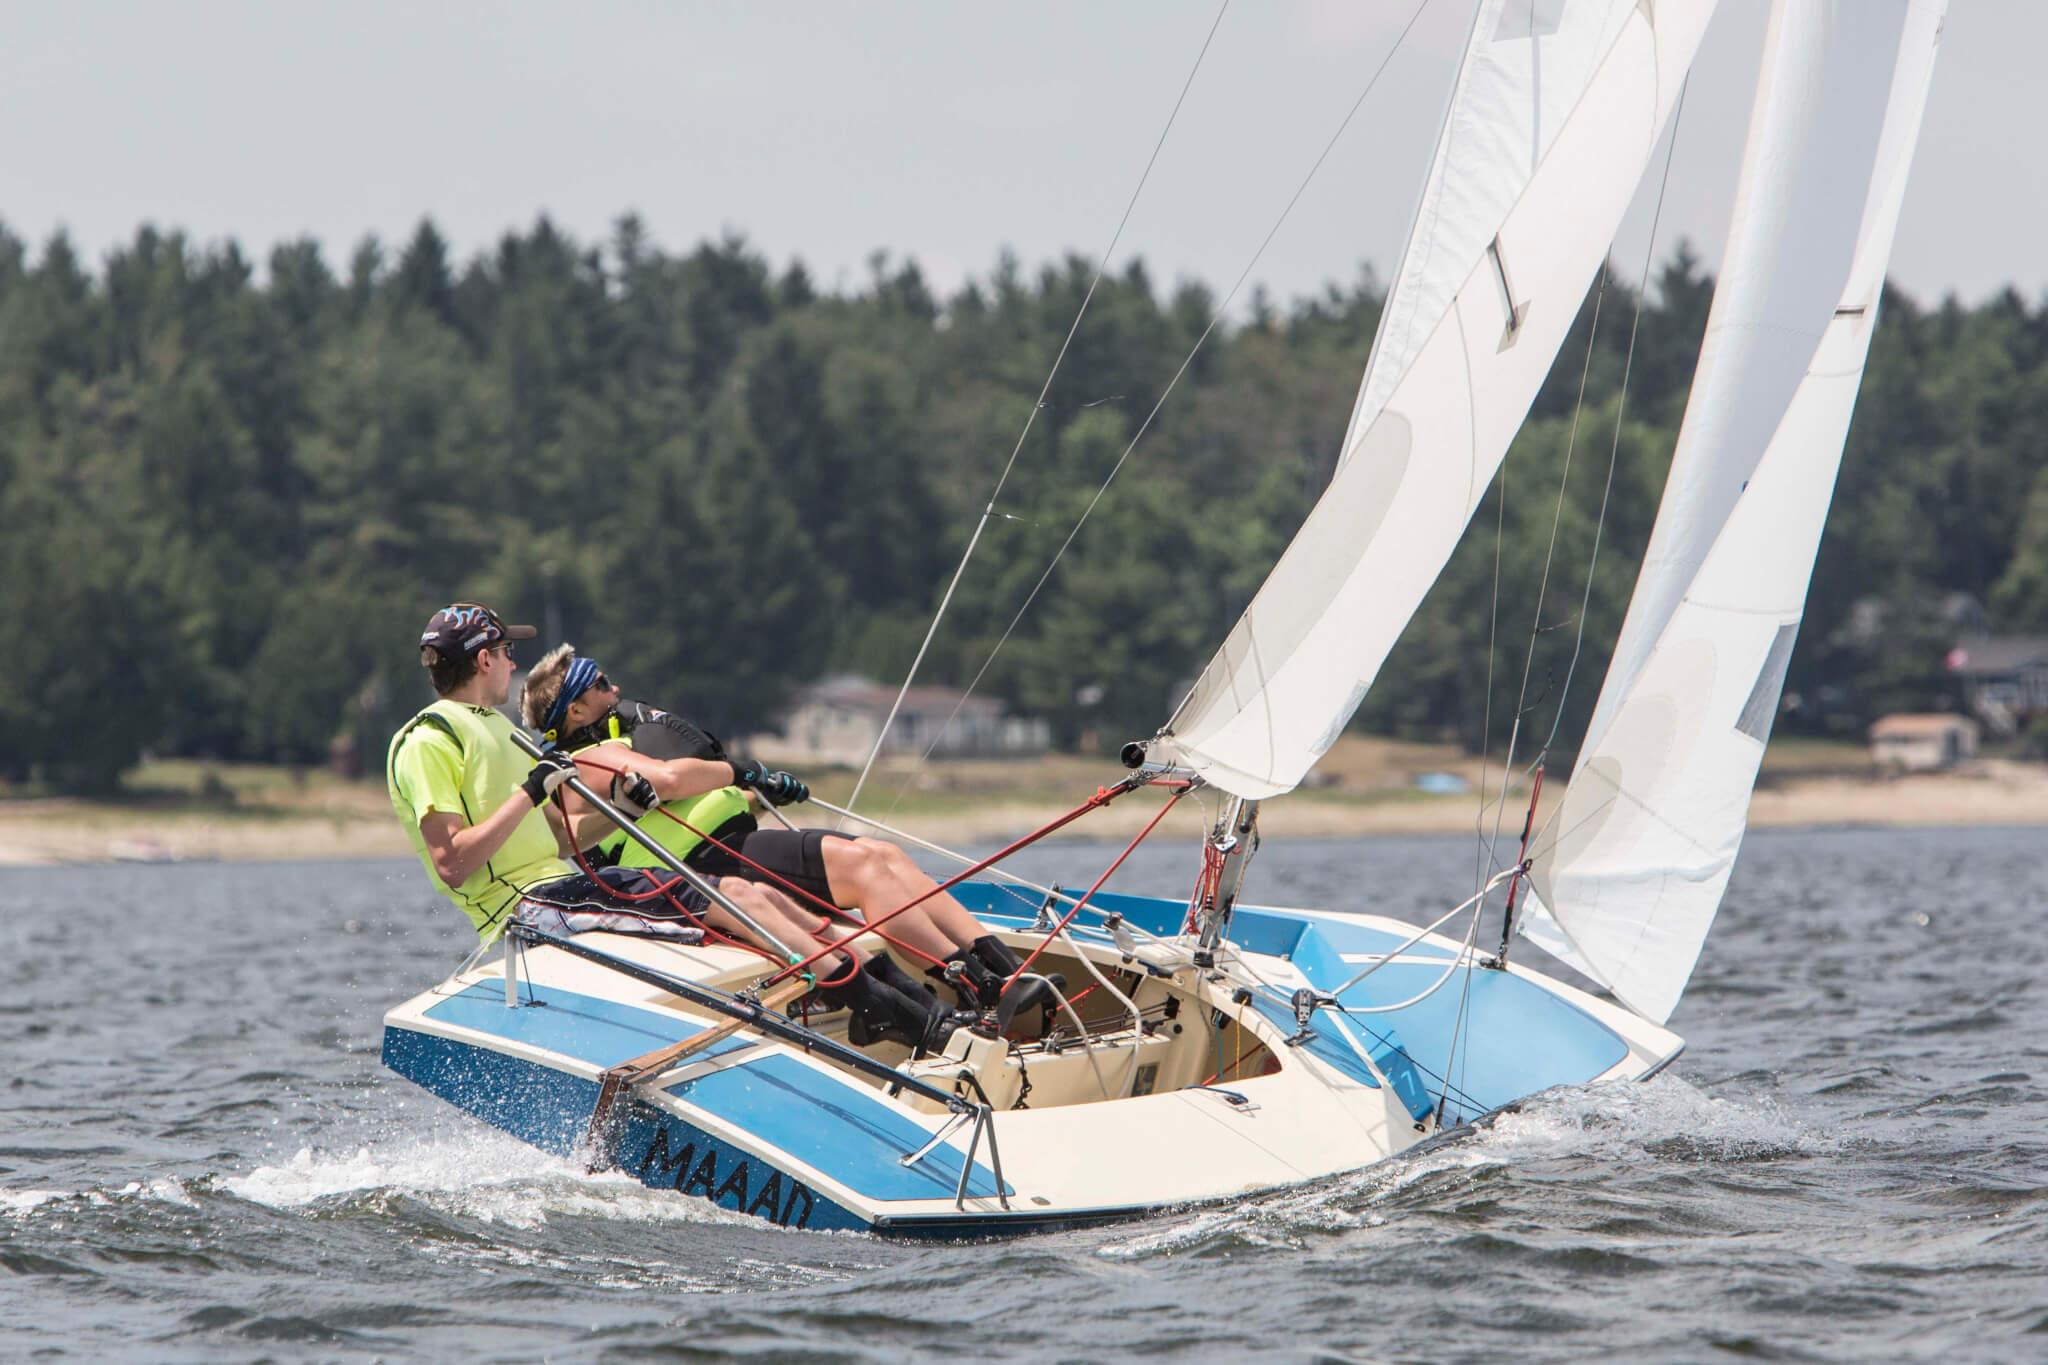 Harbor Island Yacht Club presents -            0  false      18 pt  18 pt  0  0    false  false  false                       /* Style Definitions */ table.MsoNormalTable {mso-style-name: